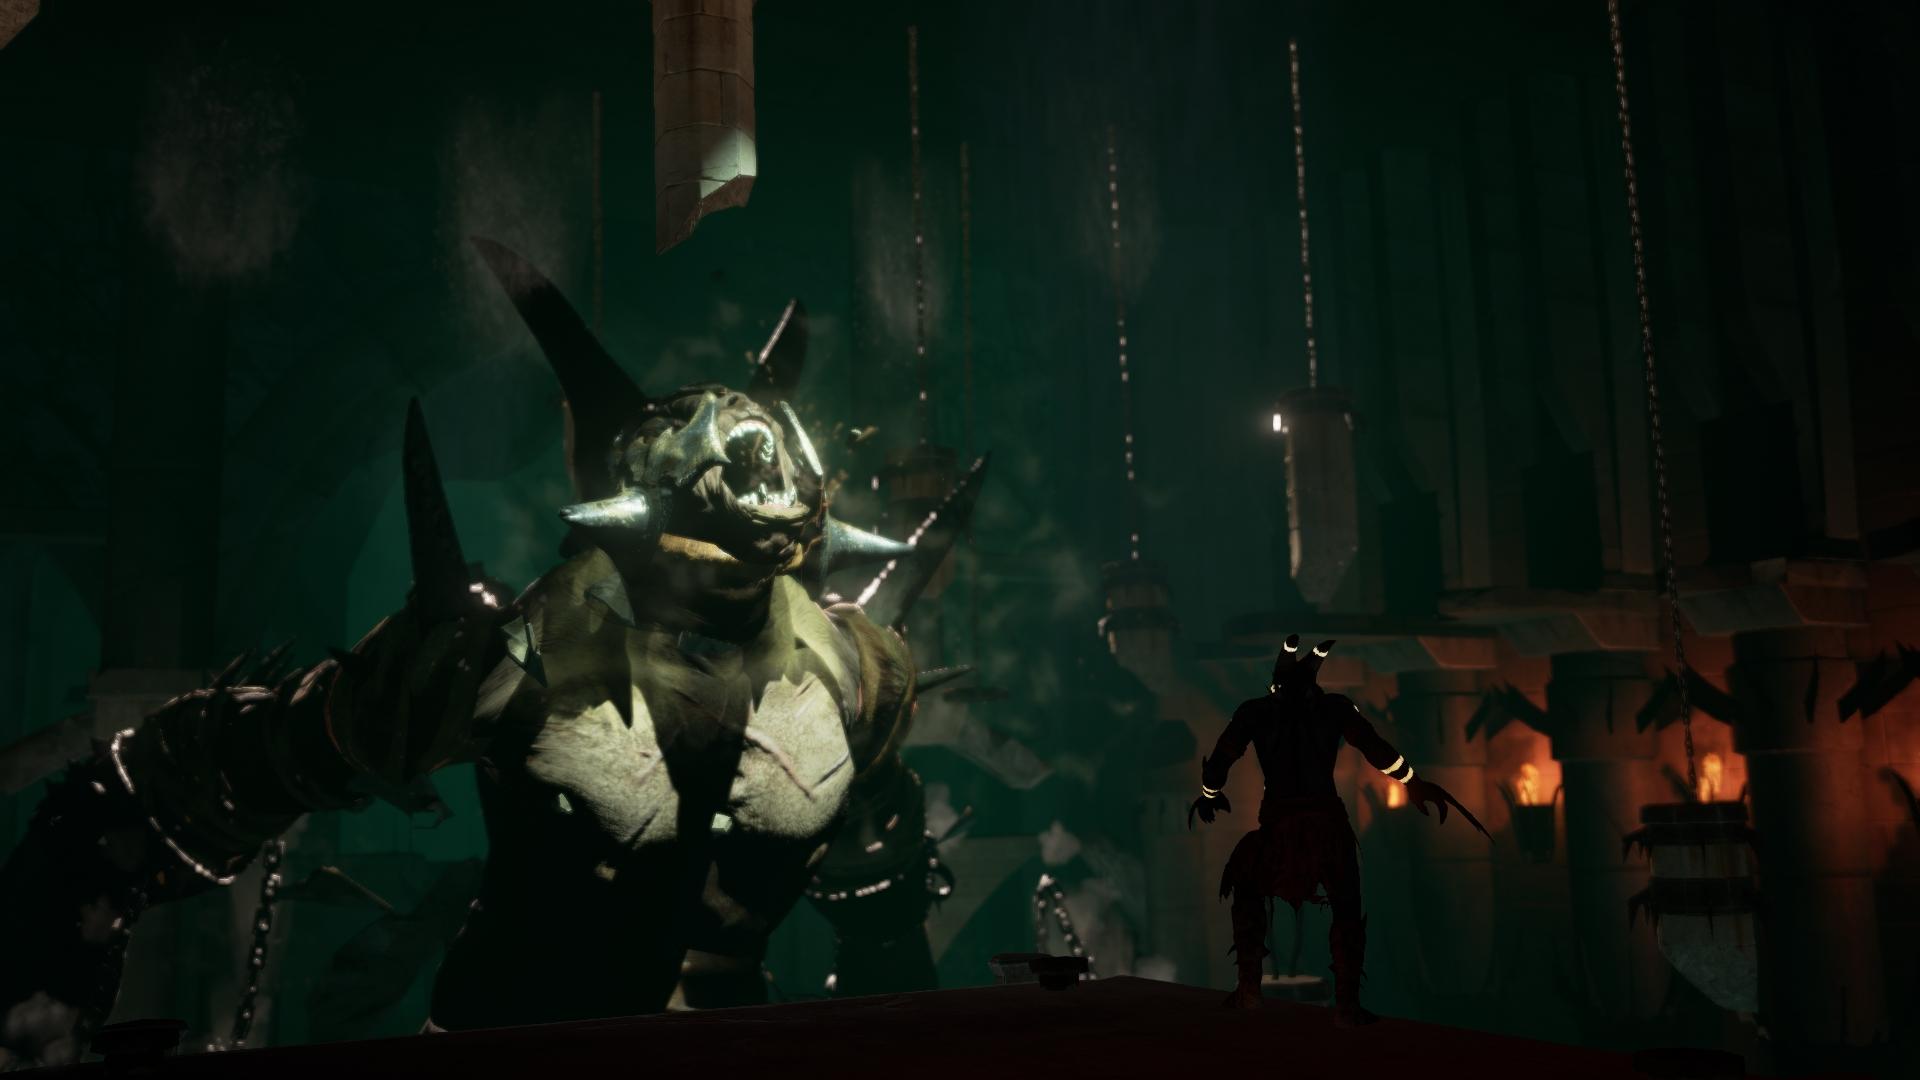 Galerie: Horizon, Uncharted 4, Last Guardian, Until Dawn 110293